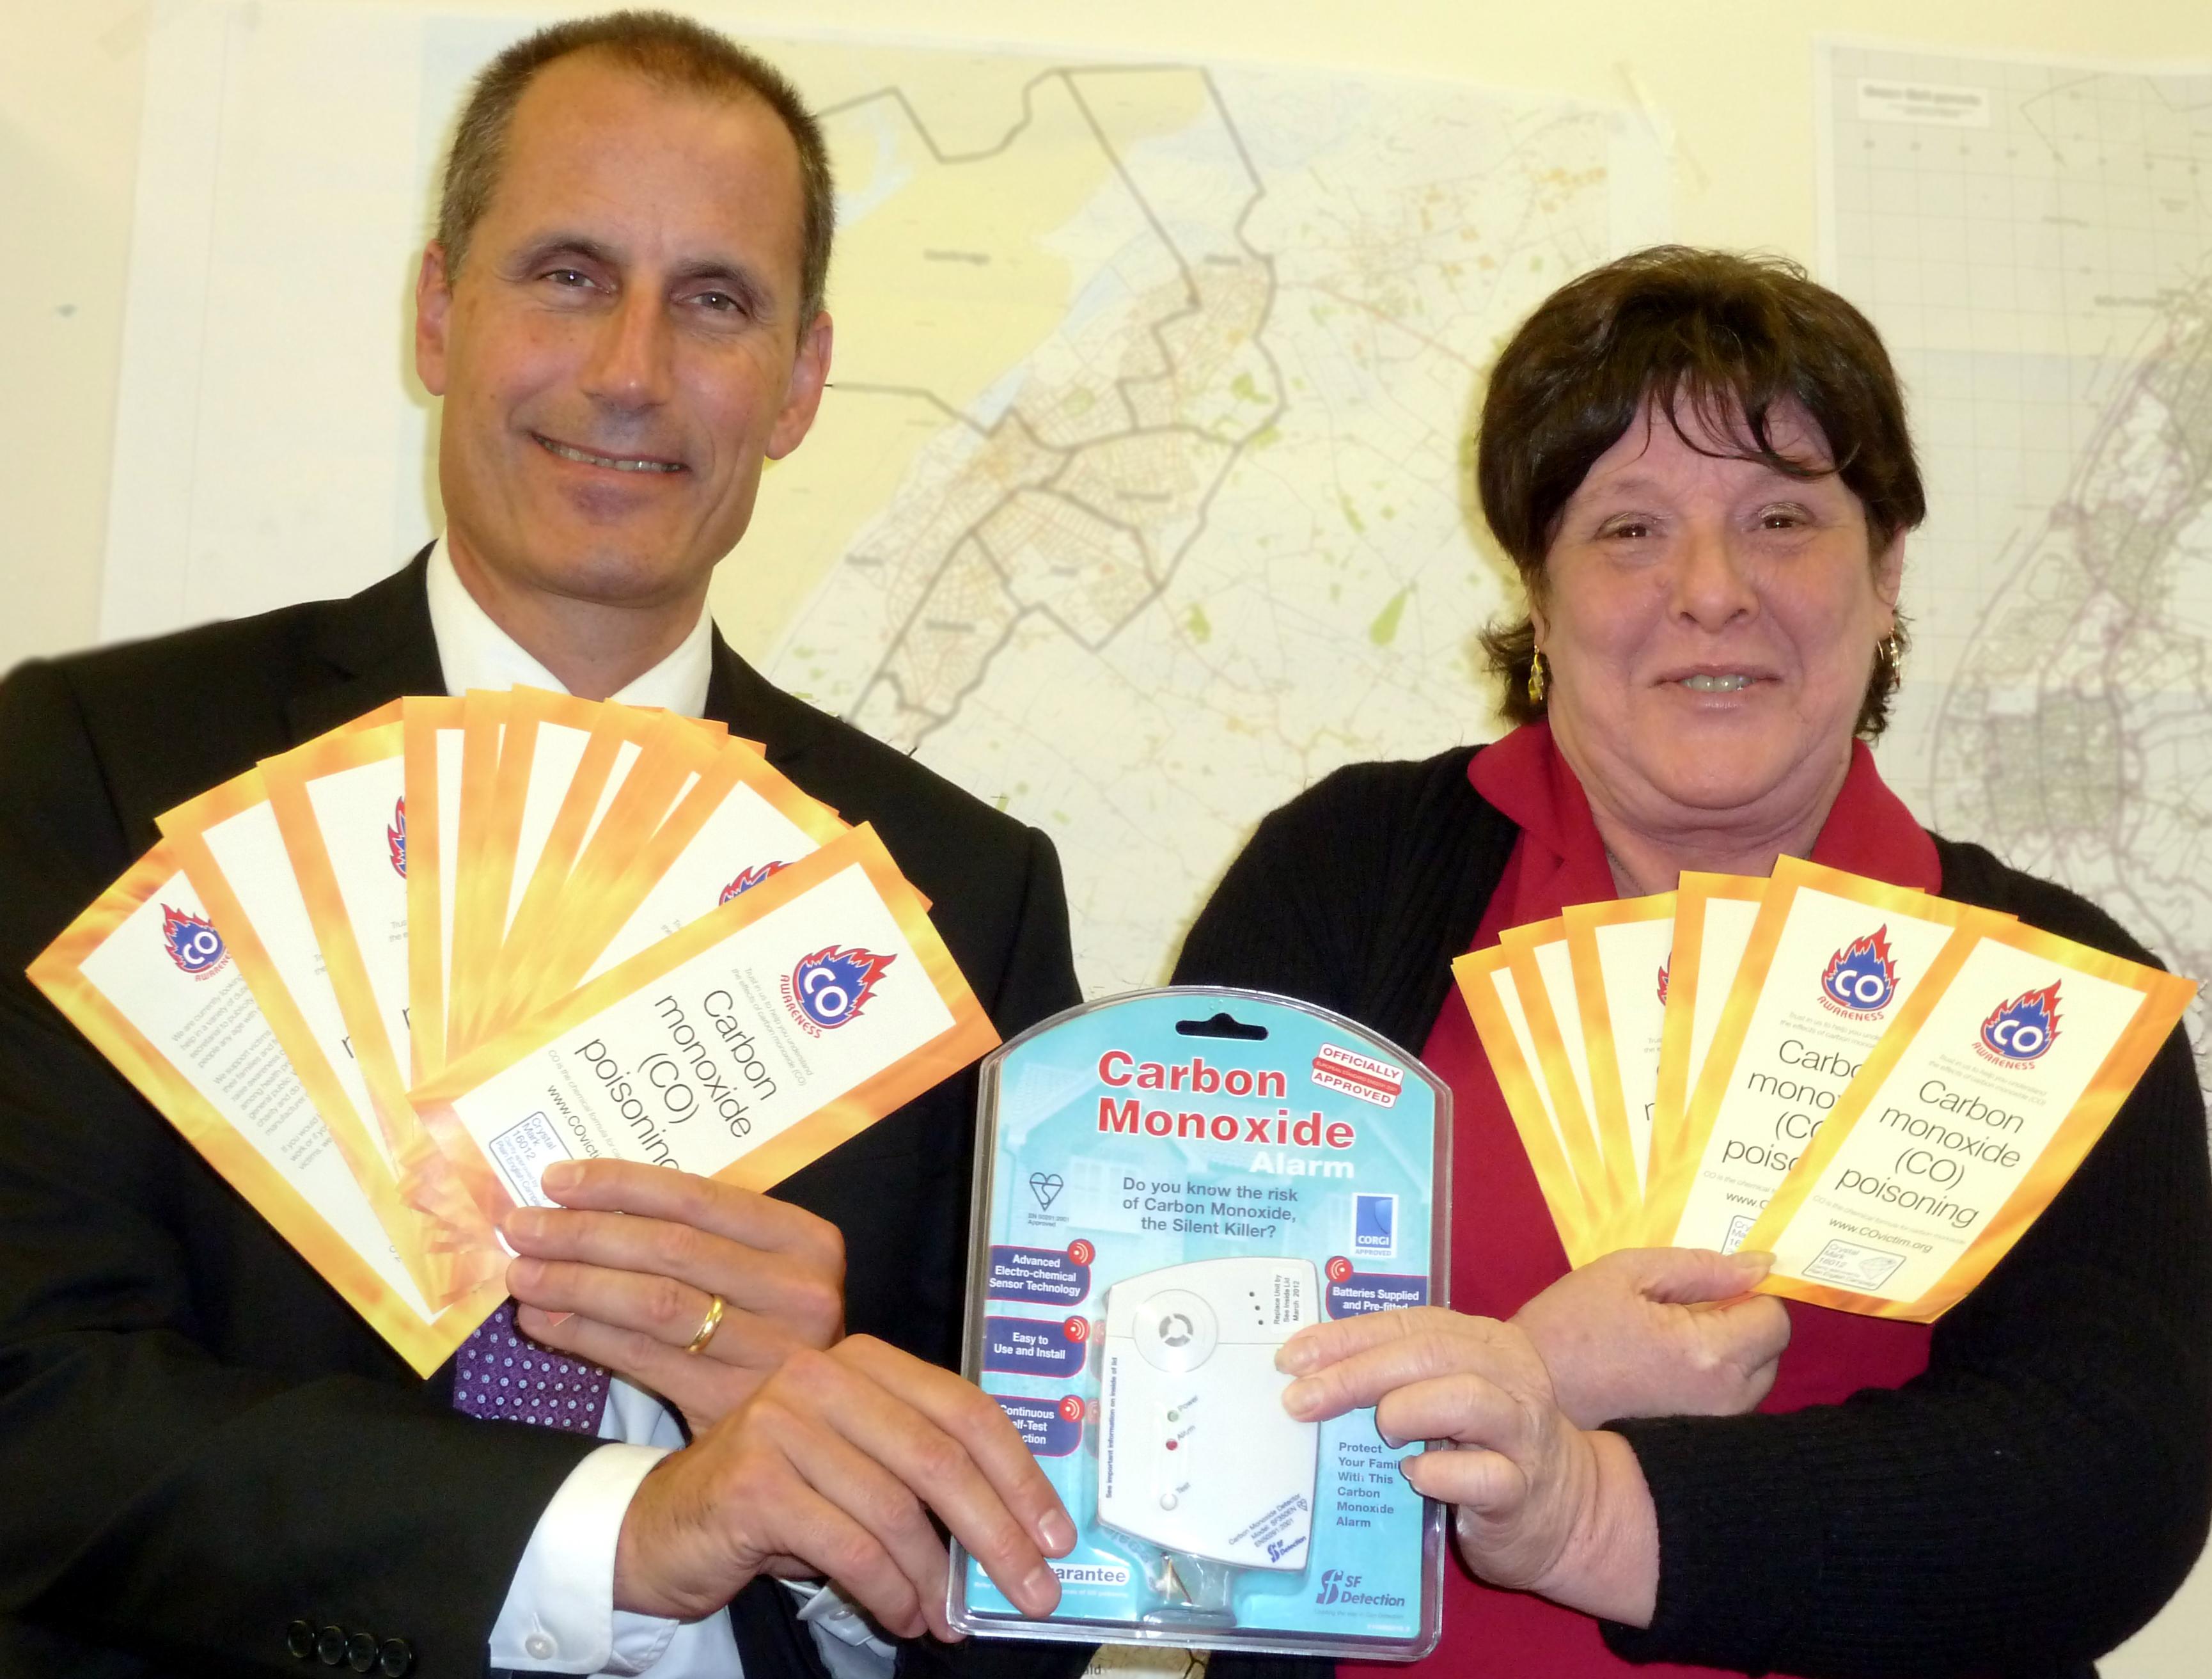 Sefton Central Labour MP Bill Esterson with Carbon Monoxide Awareness founder Lynn Griffiths.